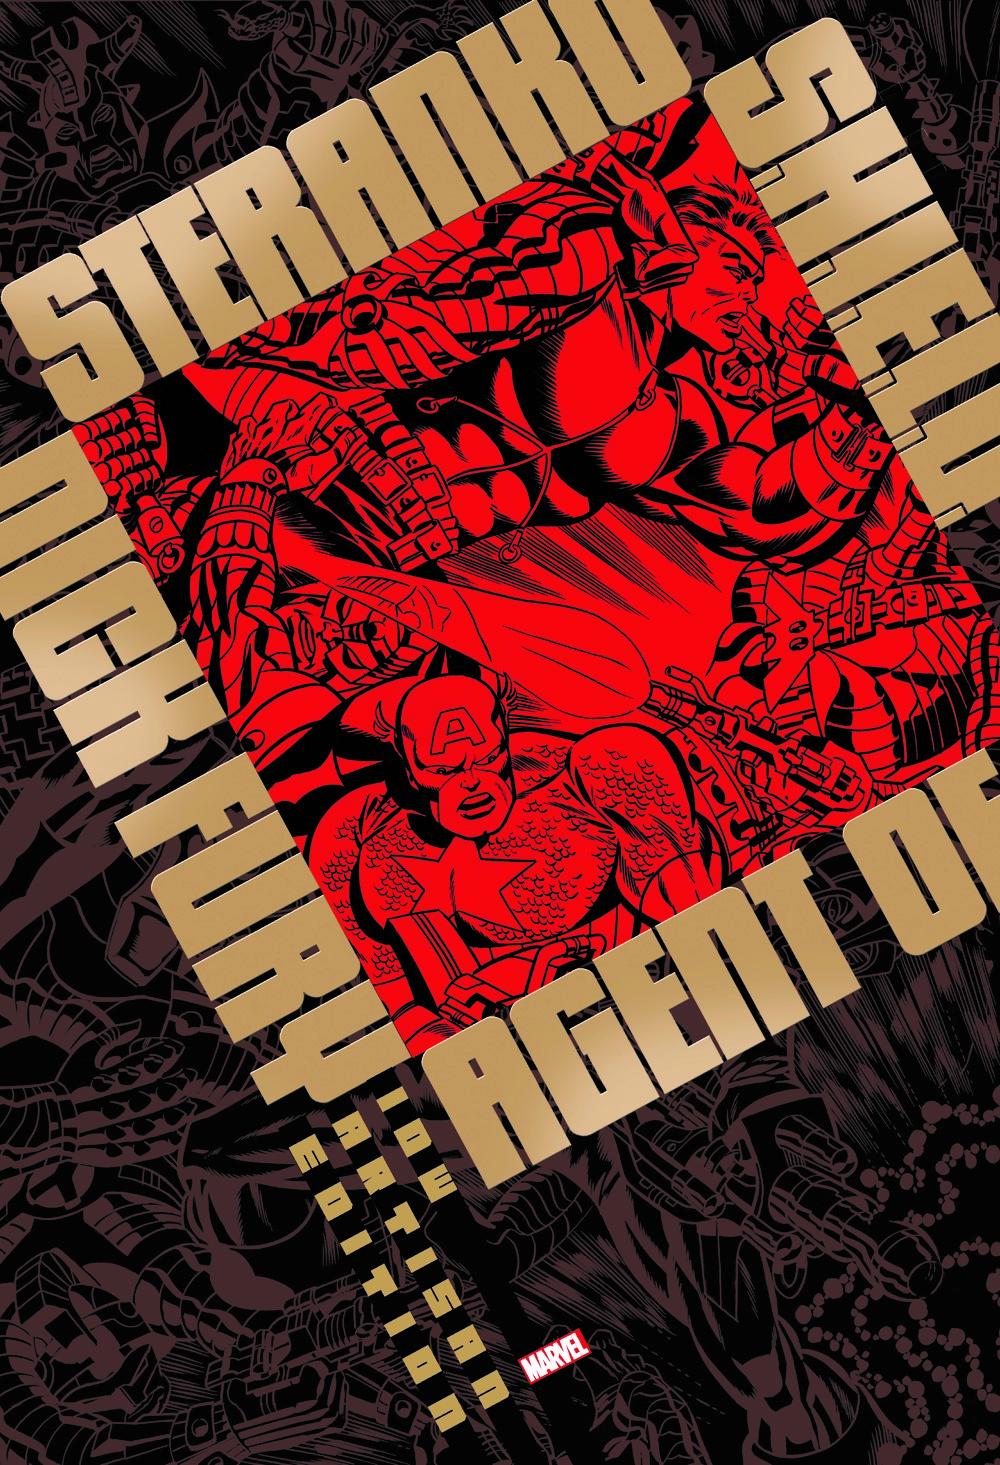 STERANKO-artisan-edition-cover-front ComicList Previews: JIM STERANKO'S NICK FURY AGENT OF S.H.I.E.L.D. ARTISAN EDITION TP